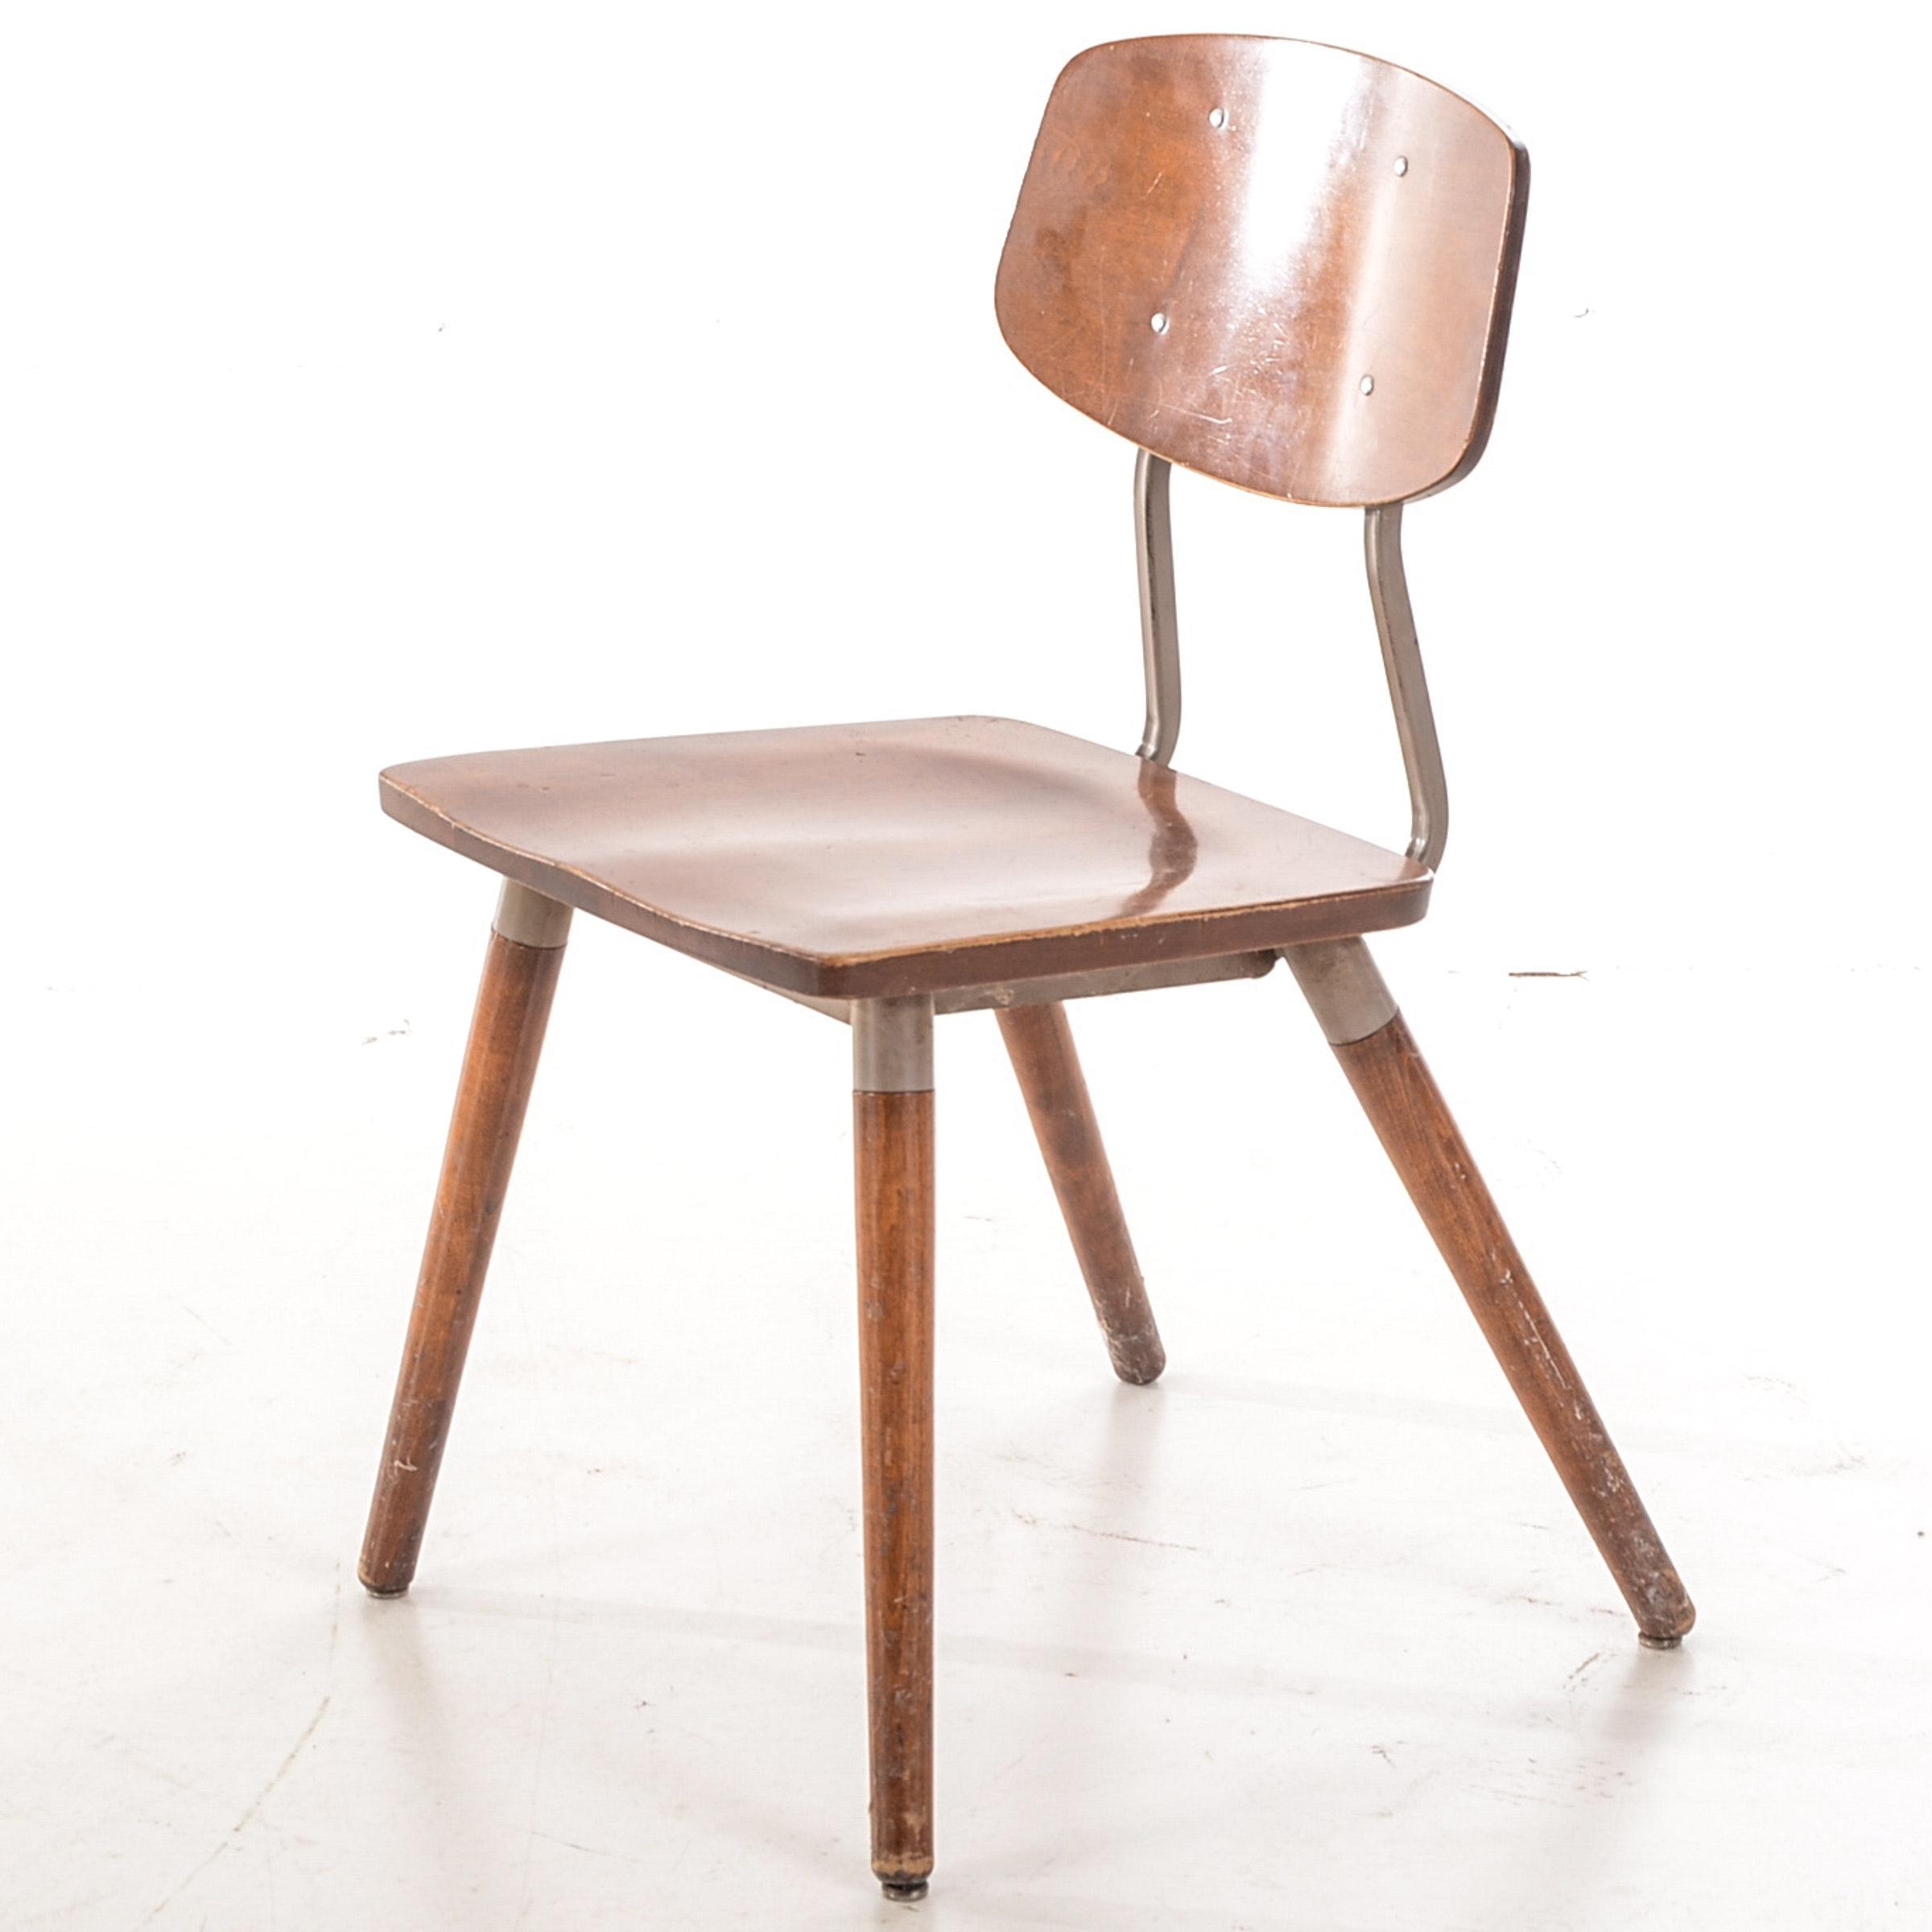 Hill-Rom Walnut Side Chair